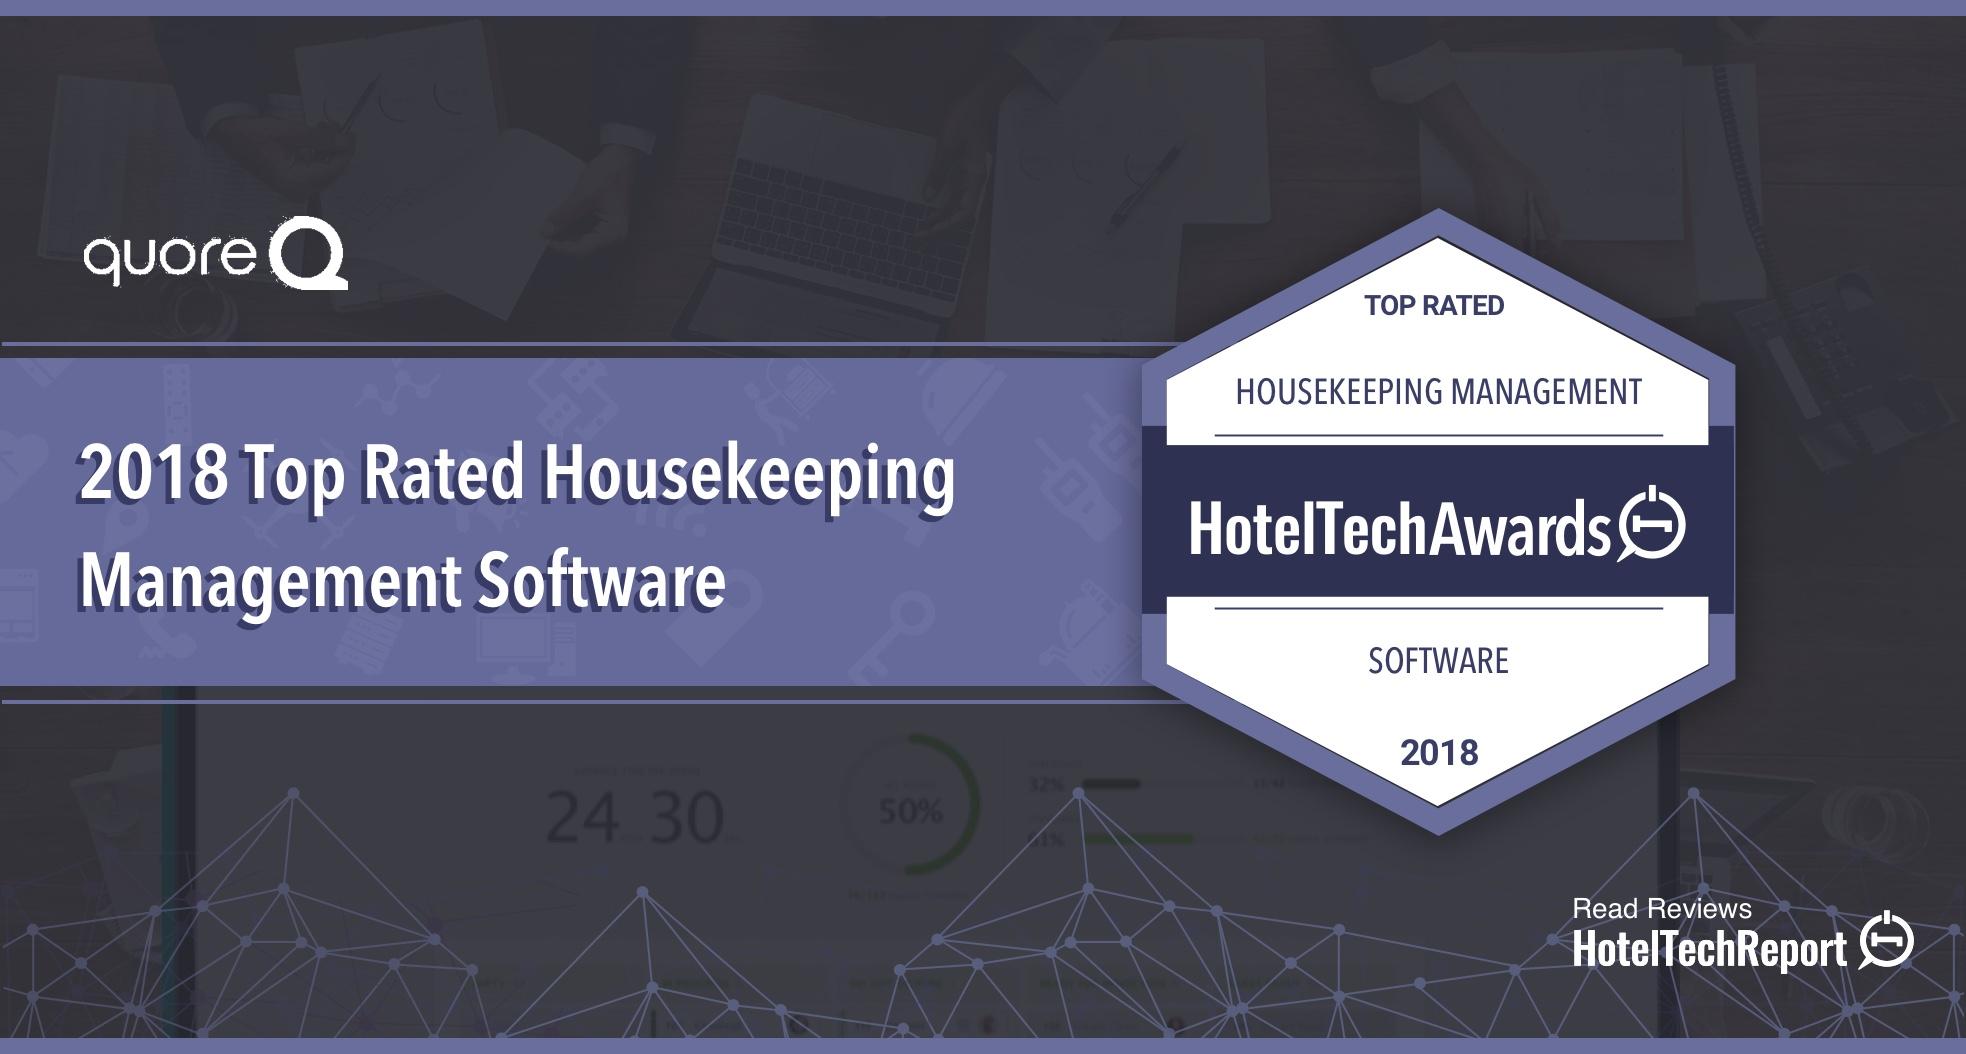 quore-hotel-tech-awards-post2x.jpg